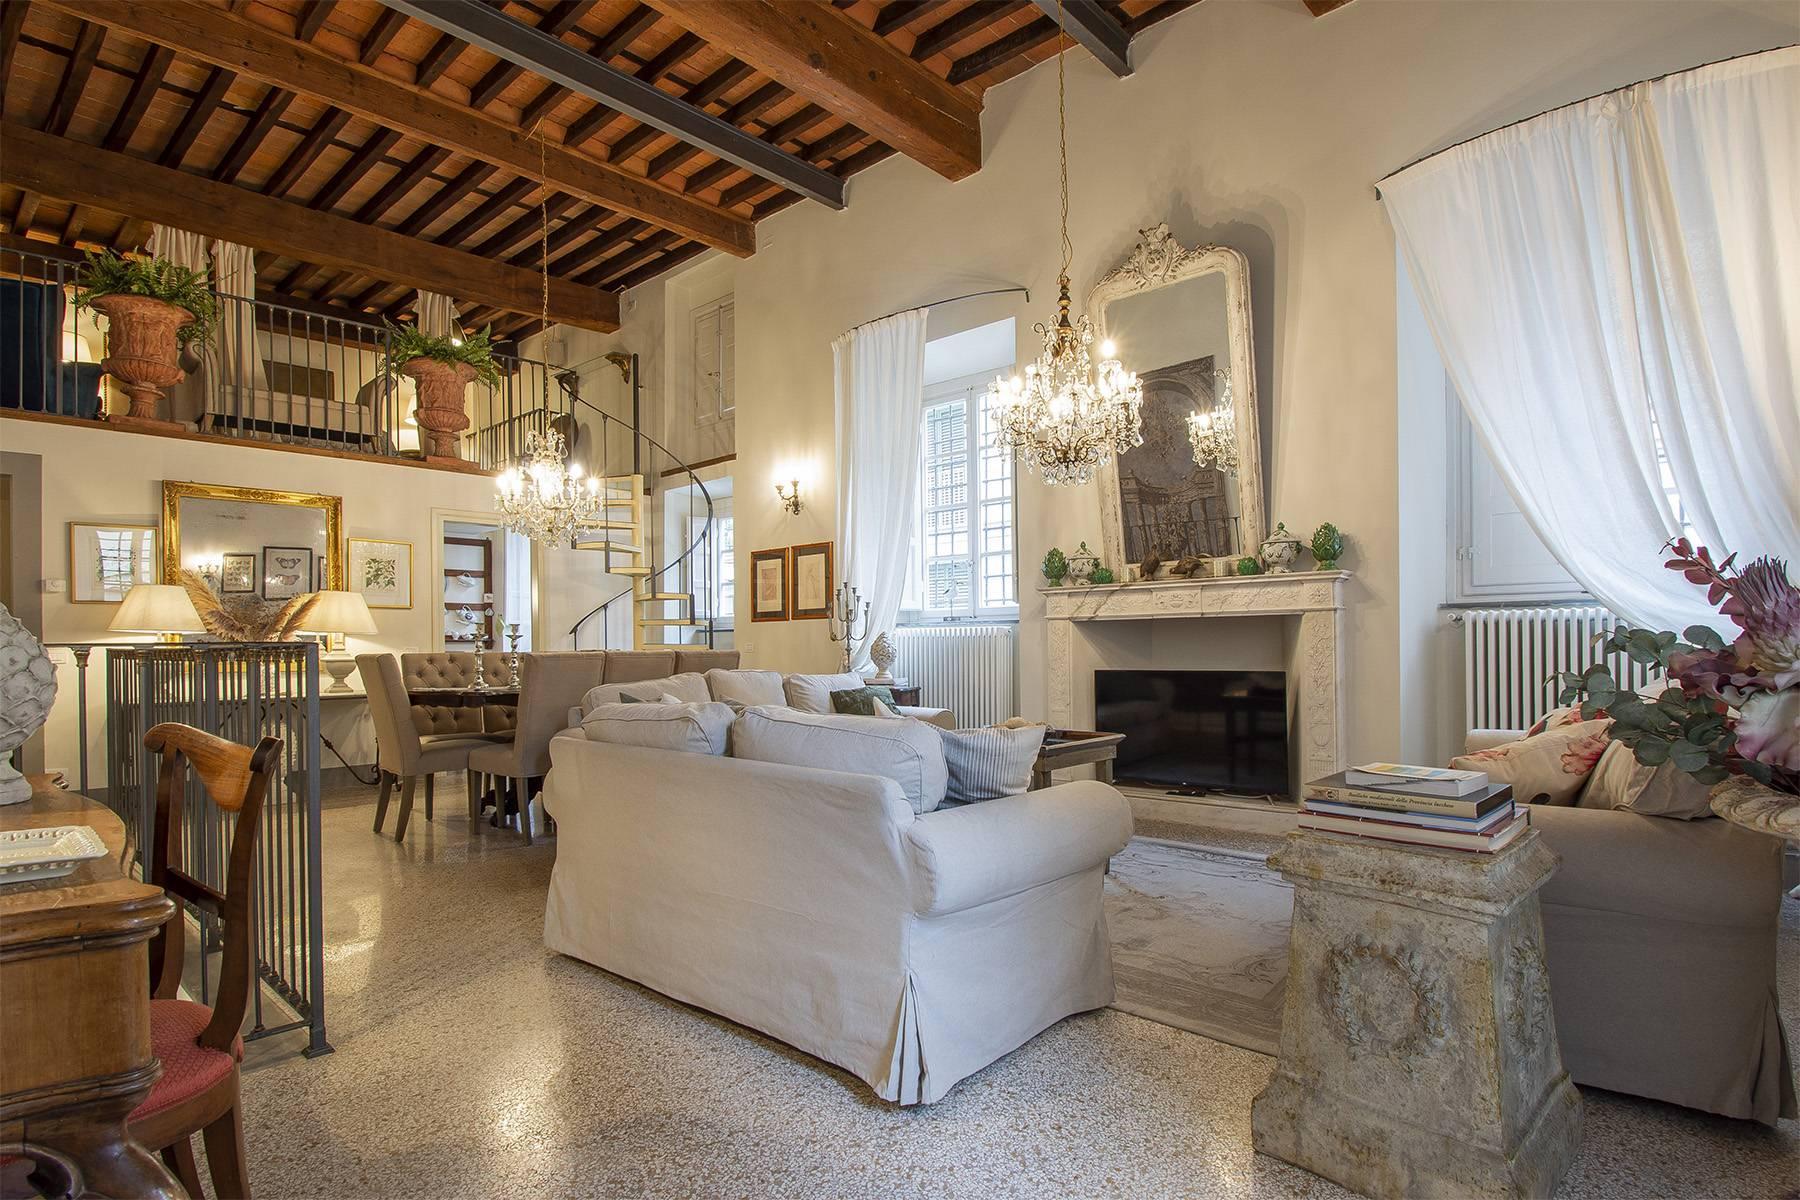 Appartement exclusif au coeur de Lucca - 2